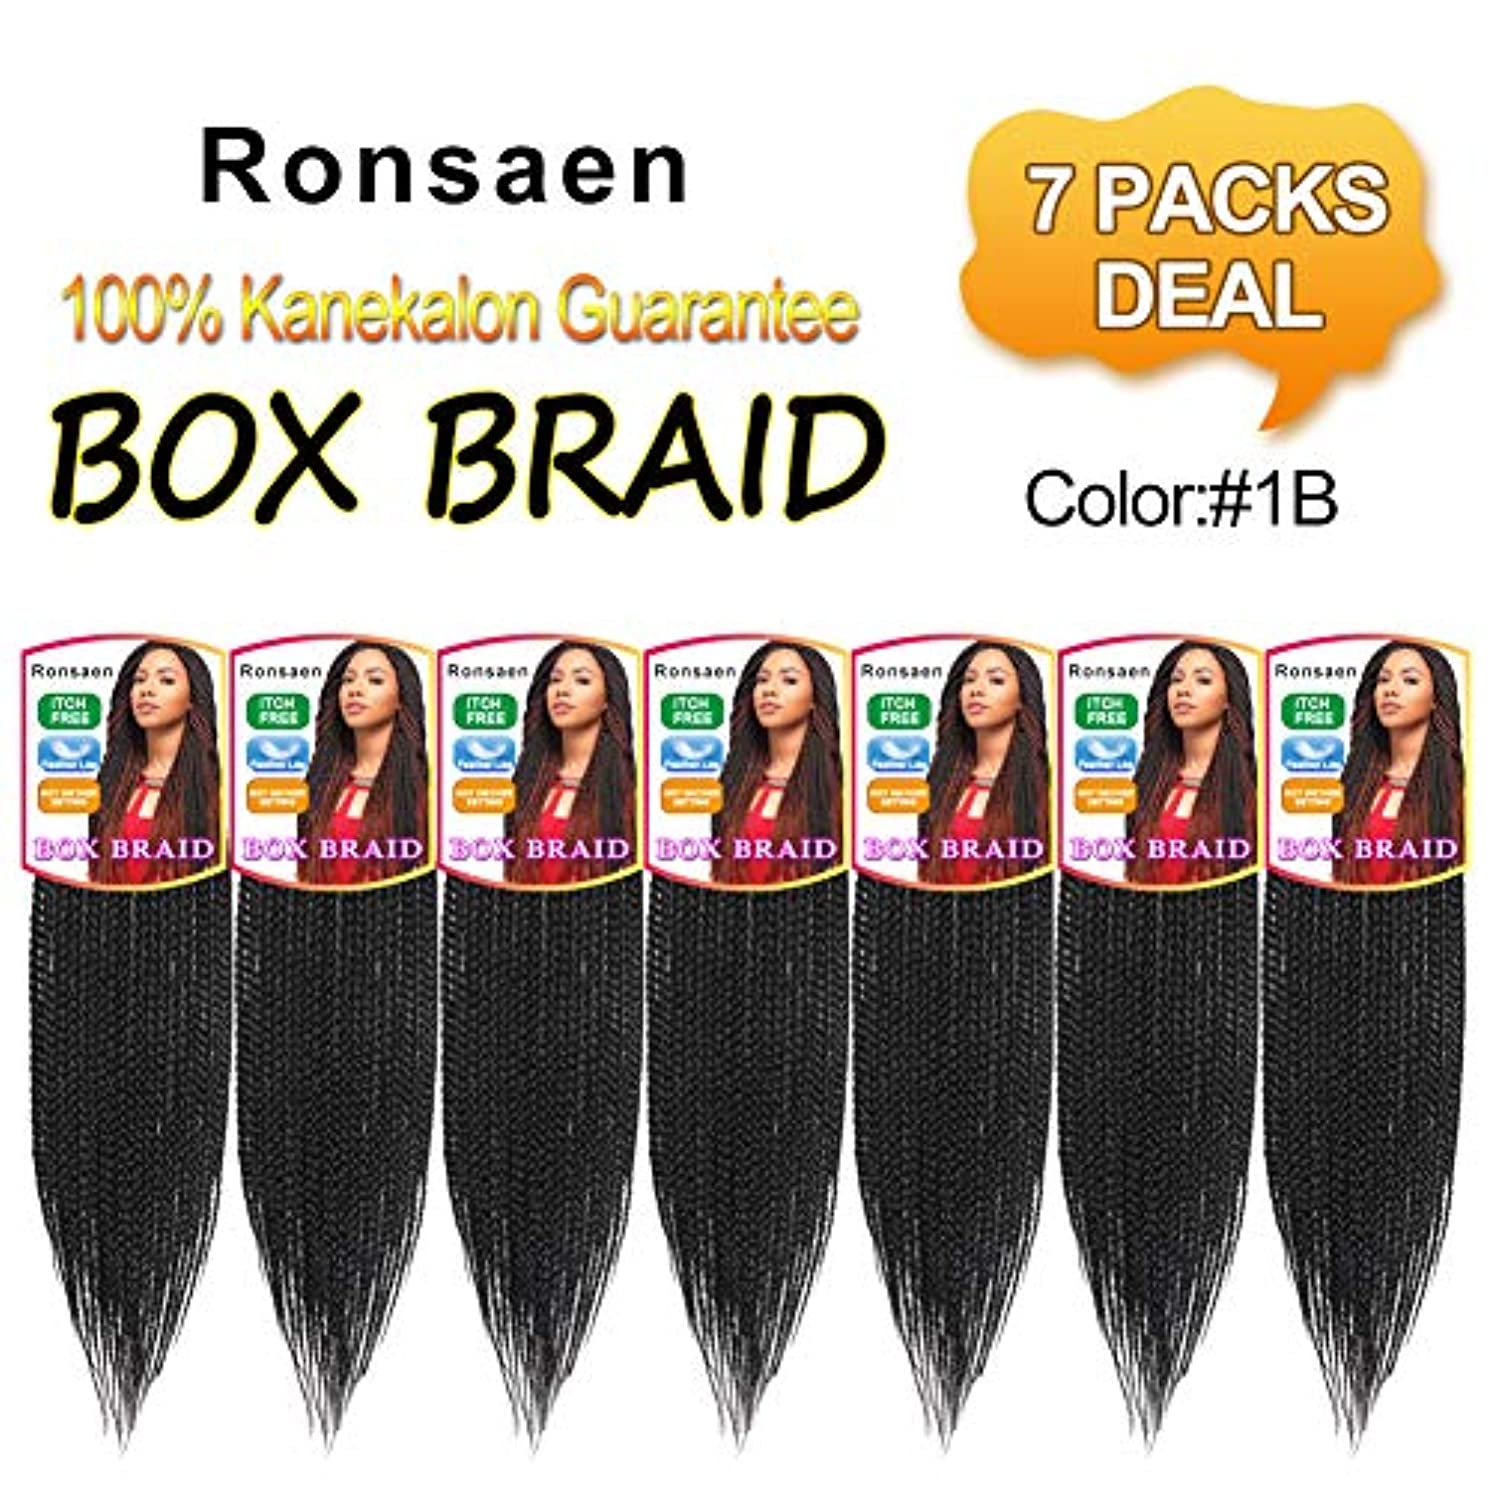 Ronsaen Box Braids Crochet Hair 100% Kanekalon Crochet Box Braids Hair (14